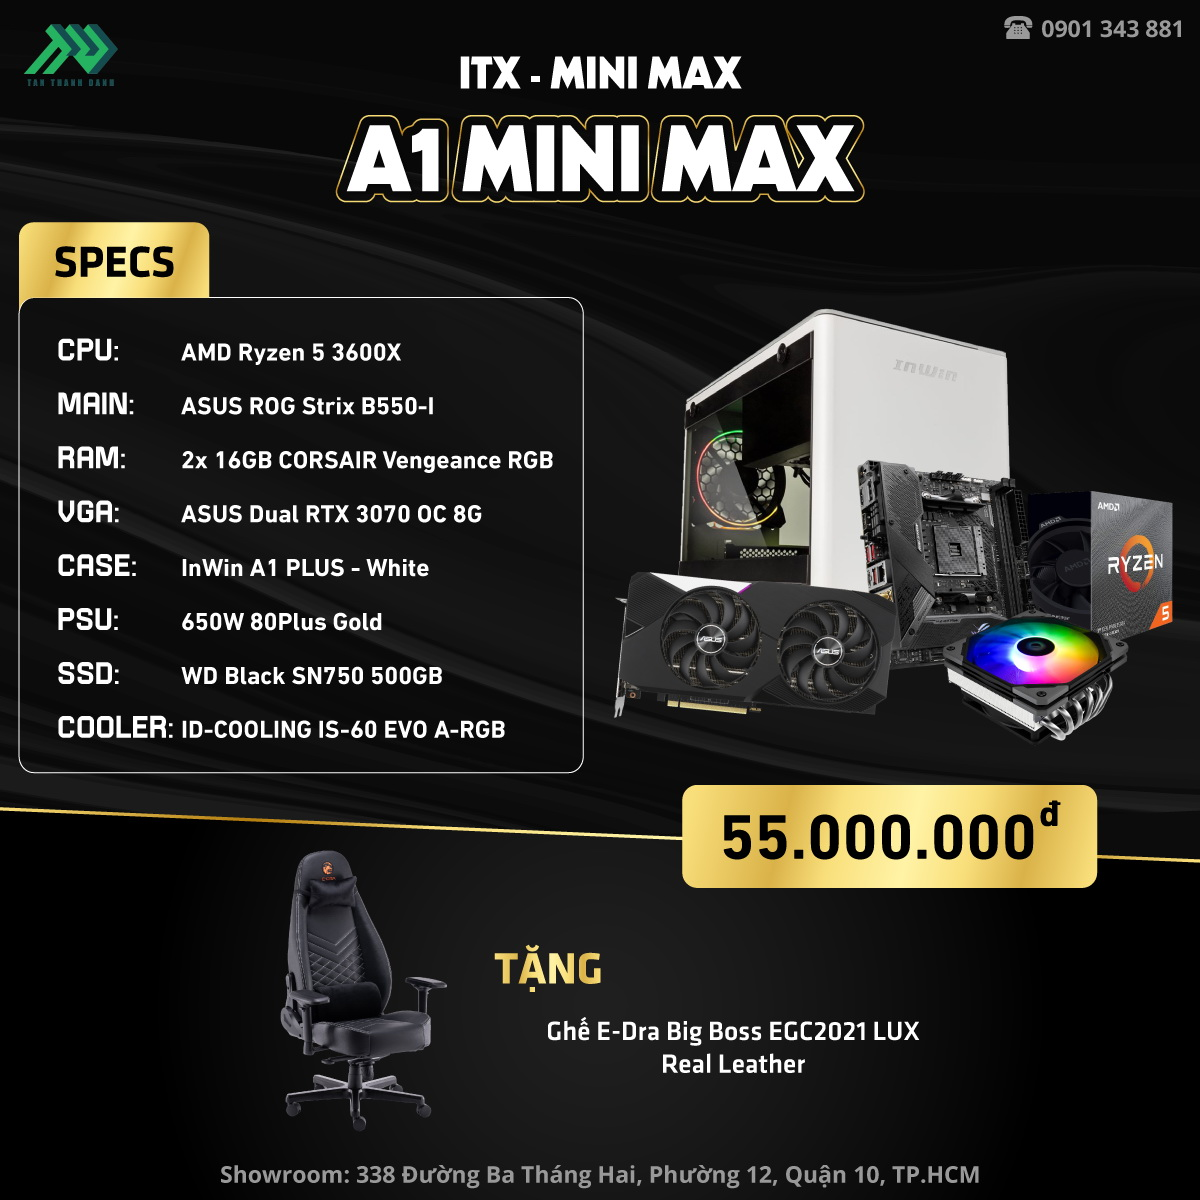 A1 Mini Max Details Black